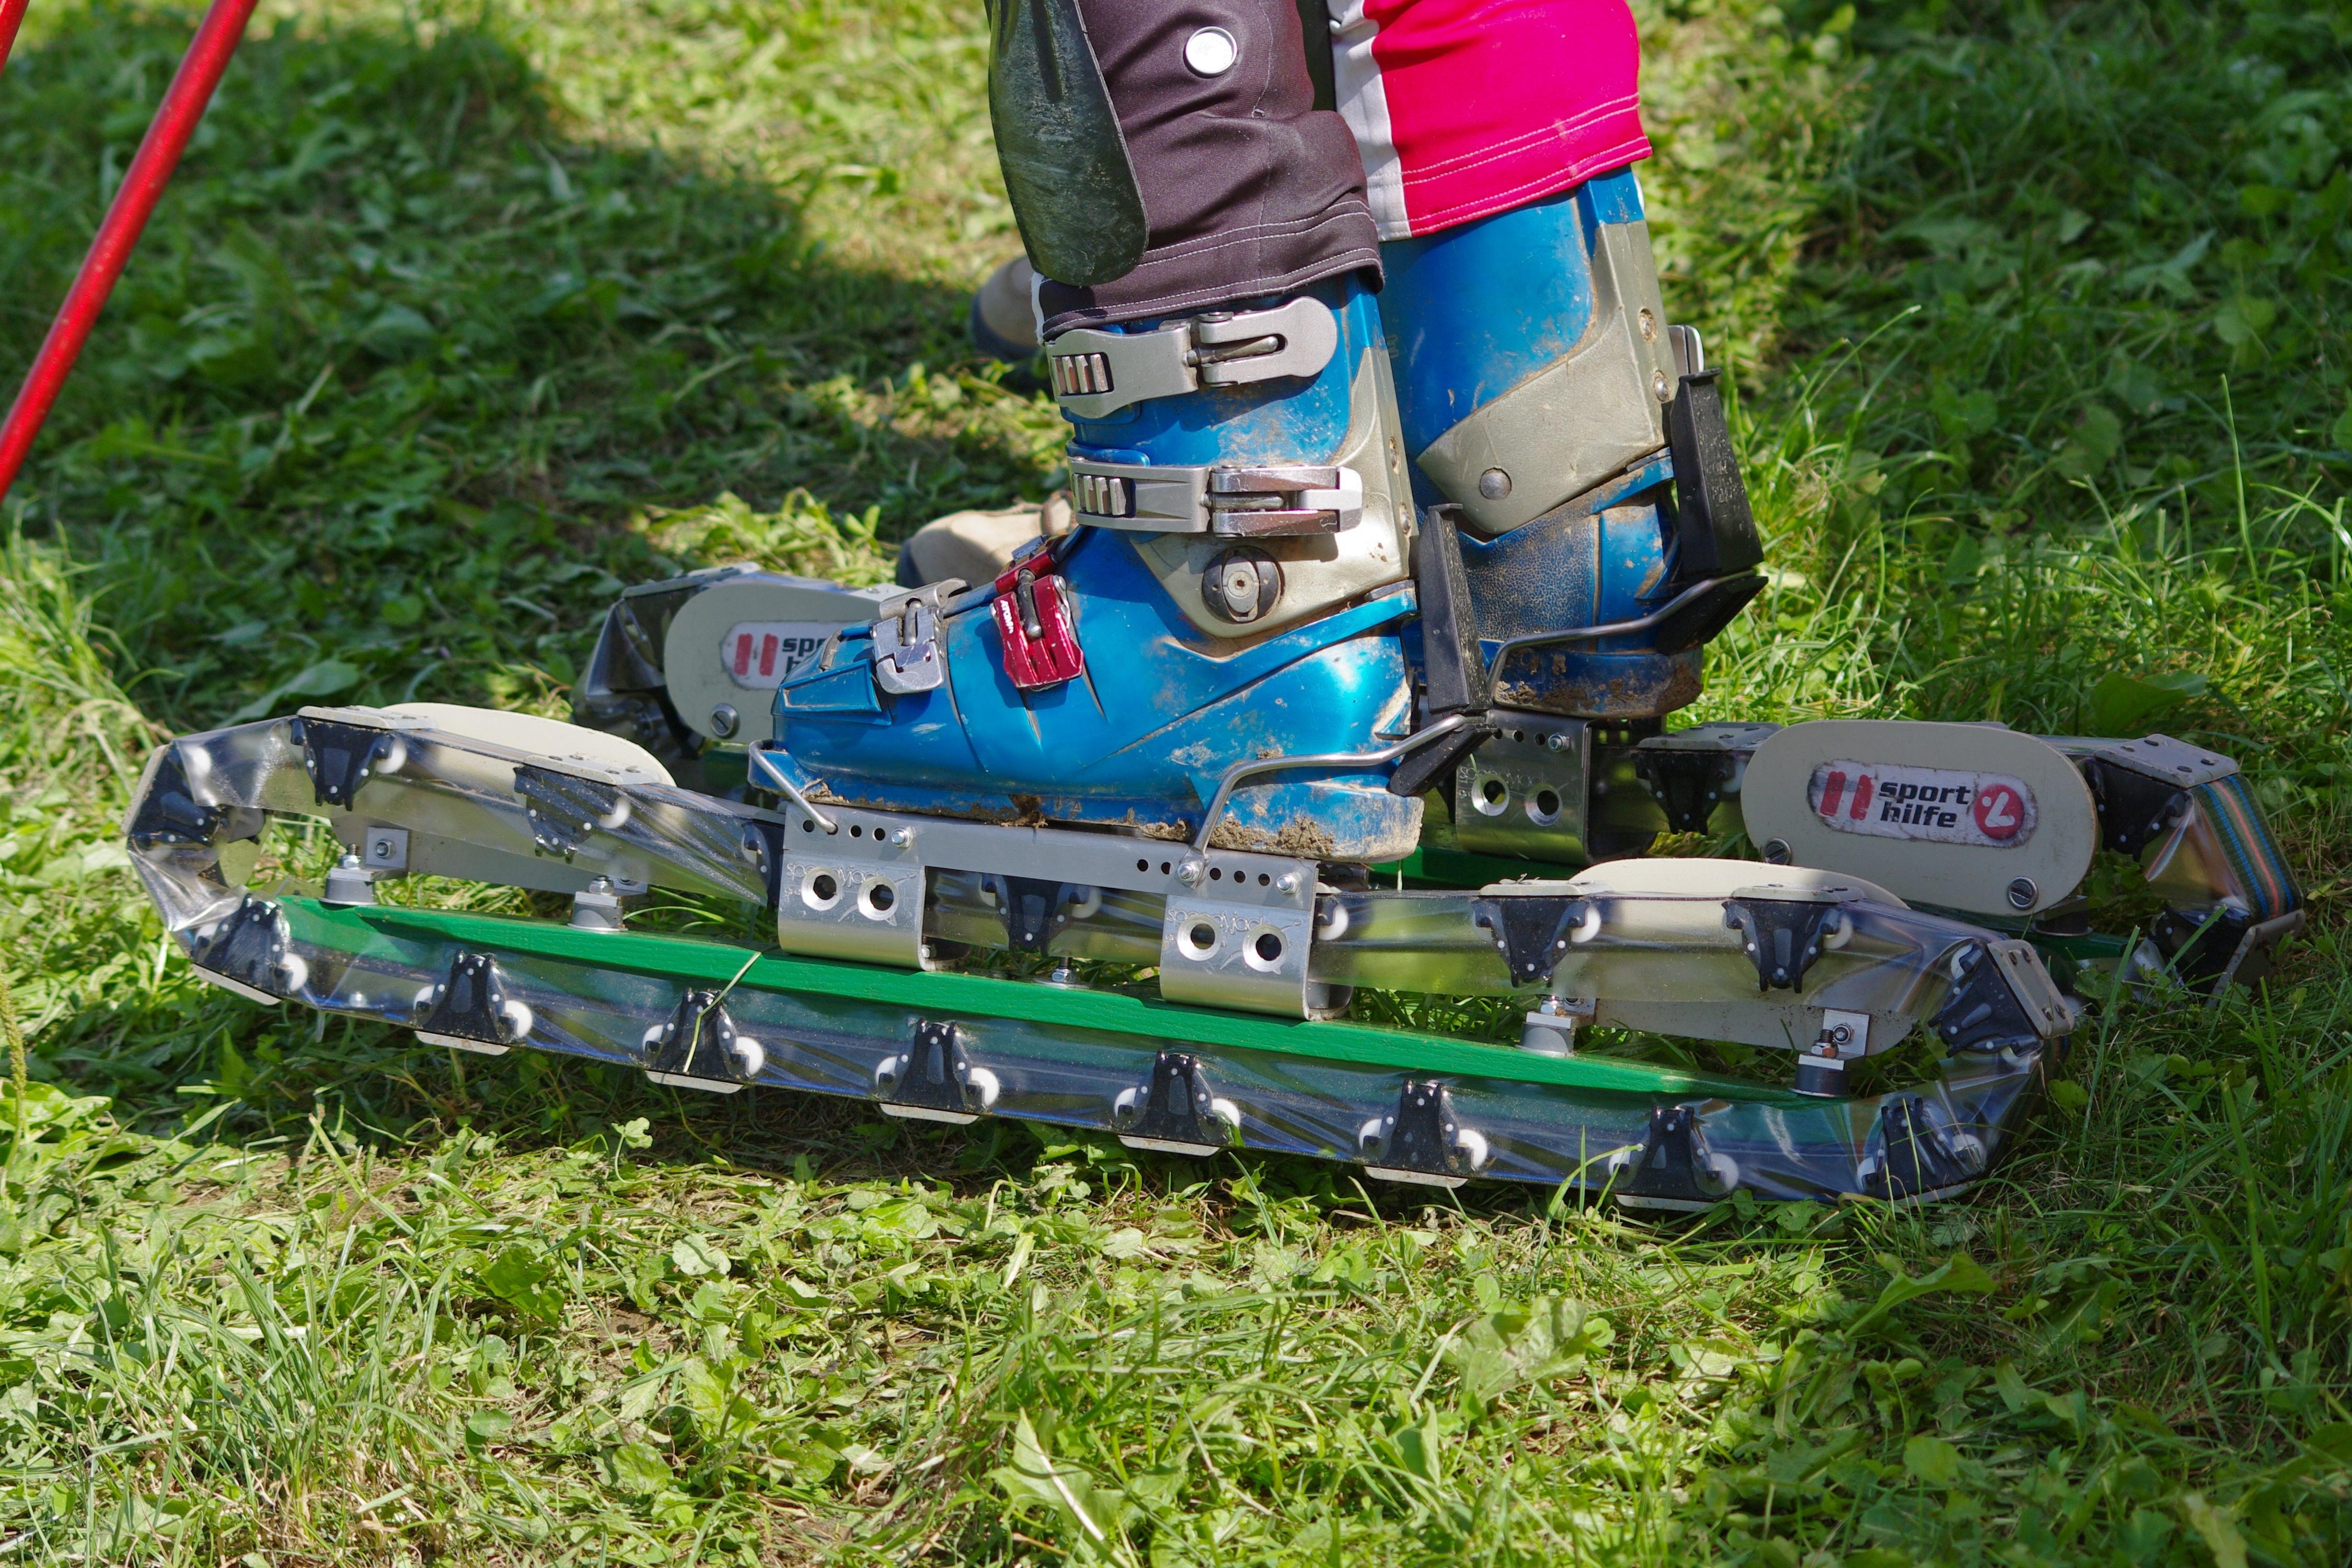 grass skiing ski gabber newschoolers com Marquette Backcountry Skis Marquette Backcountry Skis